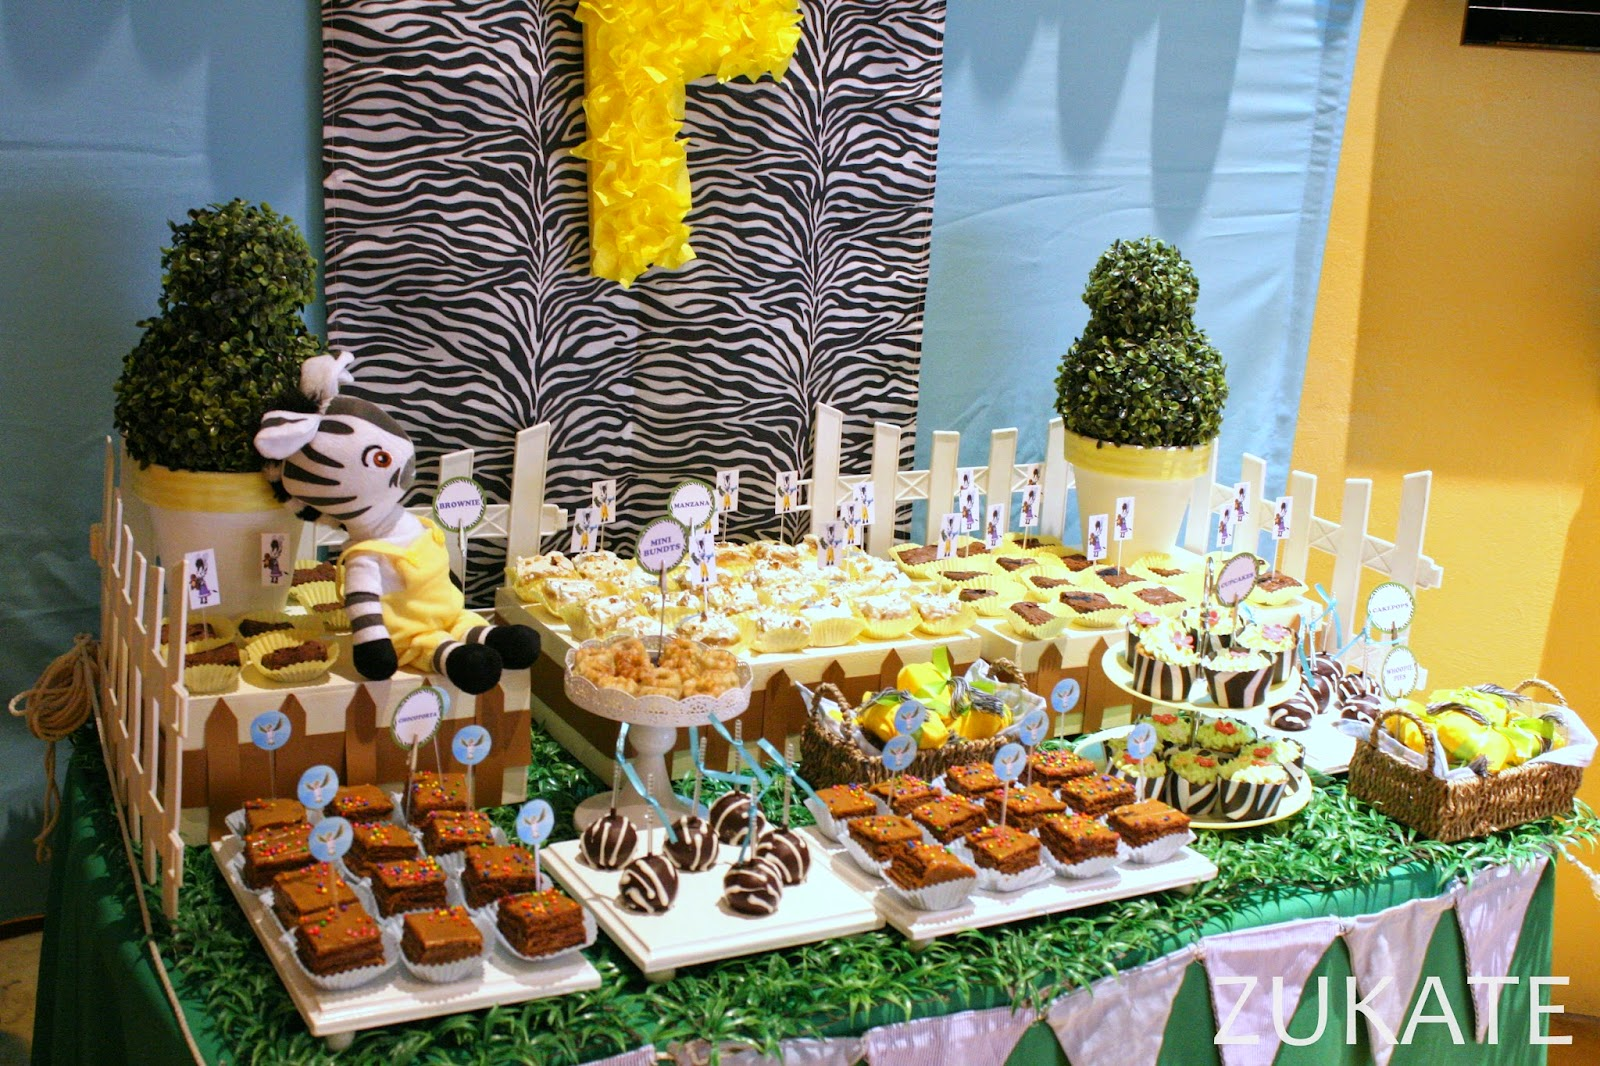 Mesa dulce de la cebra zou para fede zukate for Decoracion para mesa dulce